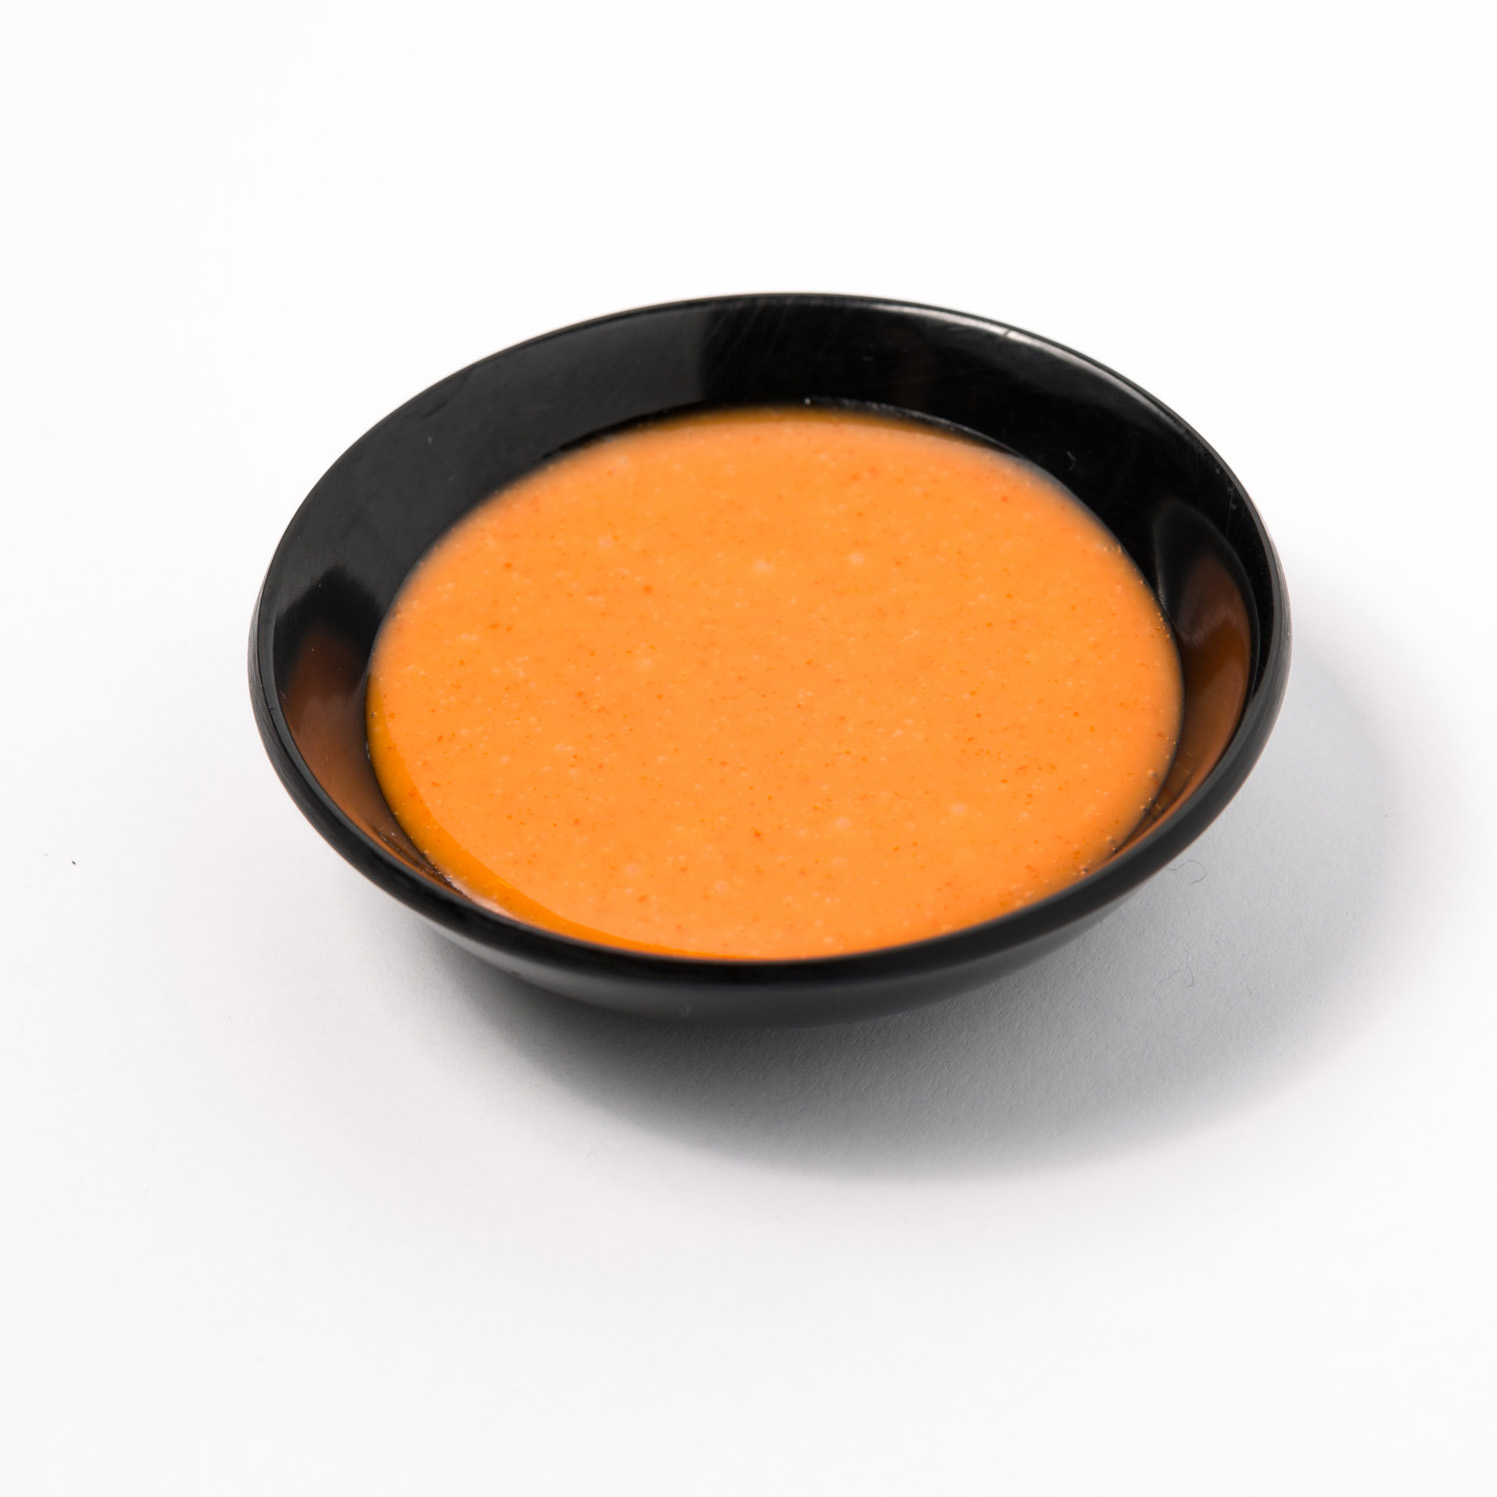 Extra Spicy Sauce